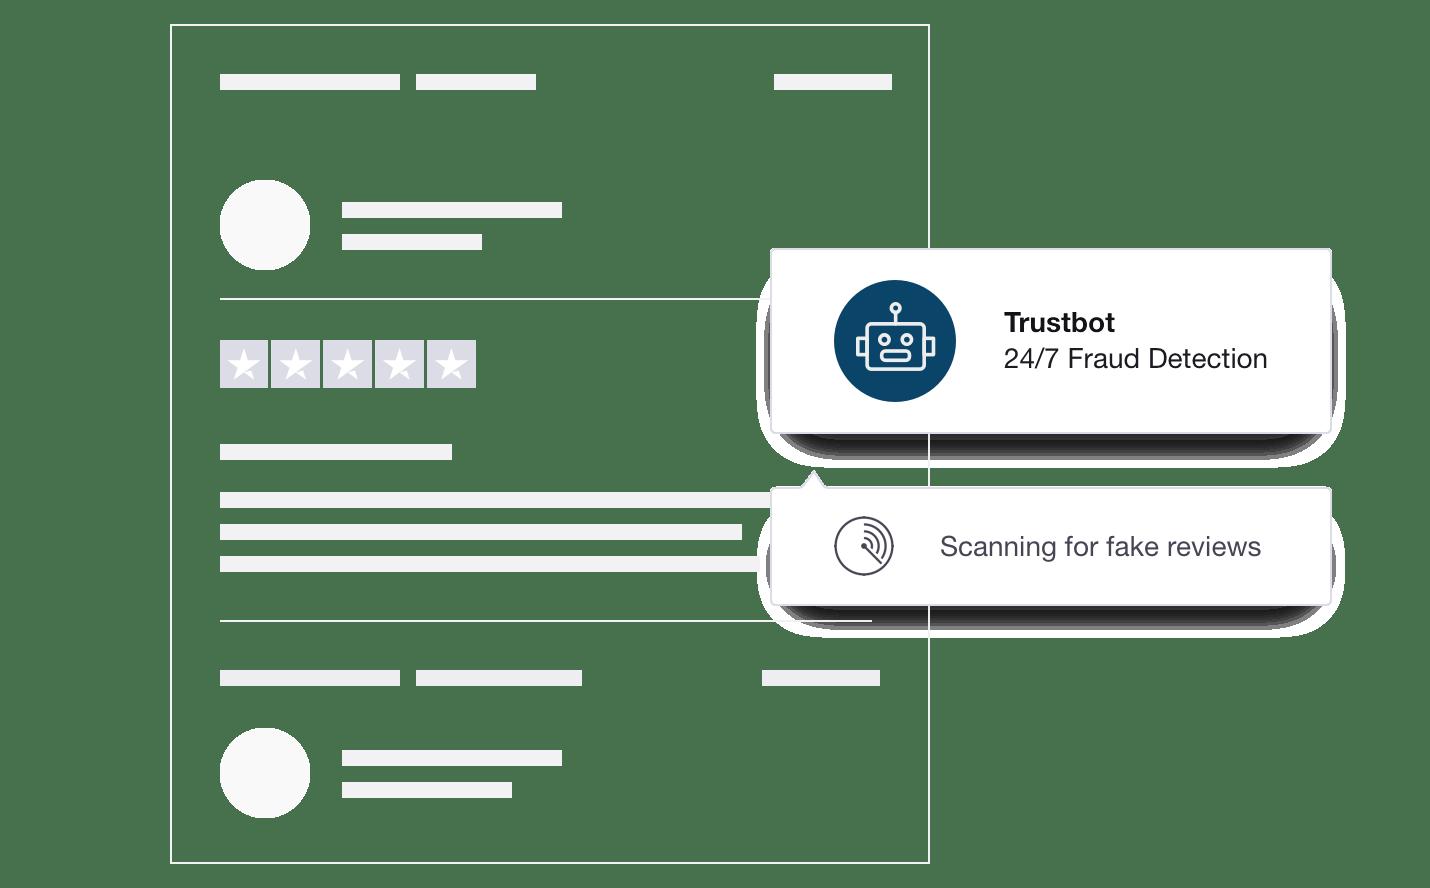 Trustpilot's 24/7 fraud detection robot